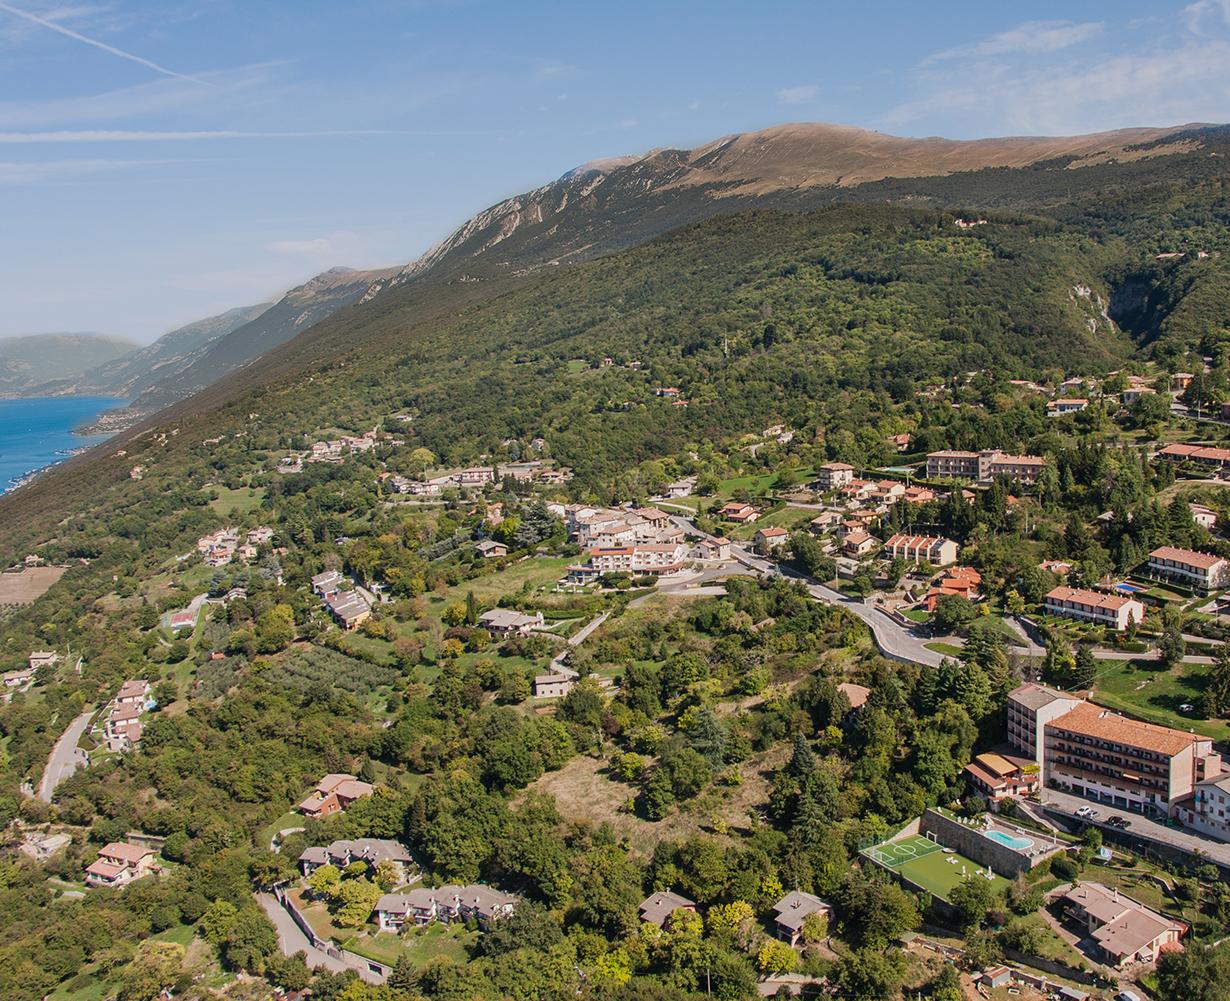 monte-baldo-hotel-piscina-san-zeno-di-montagna